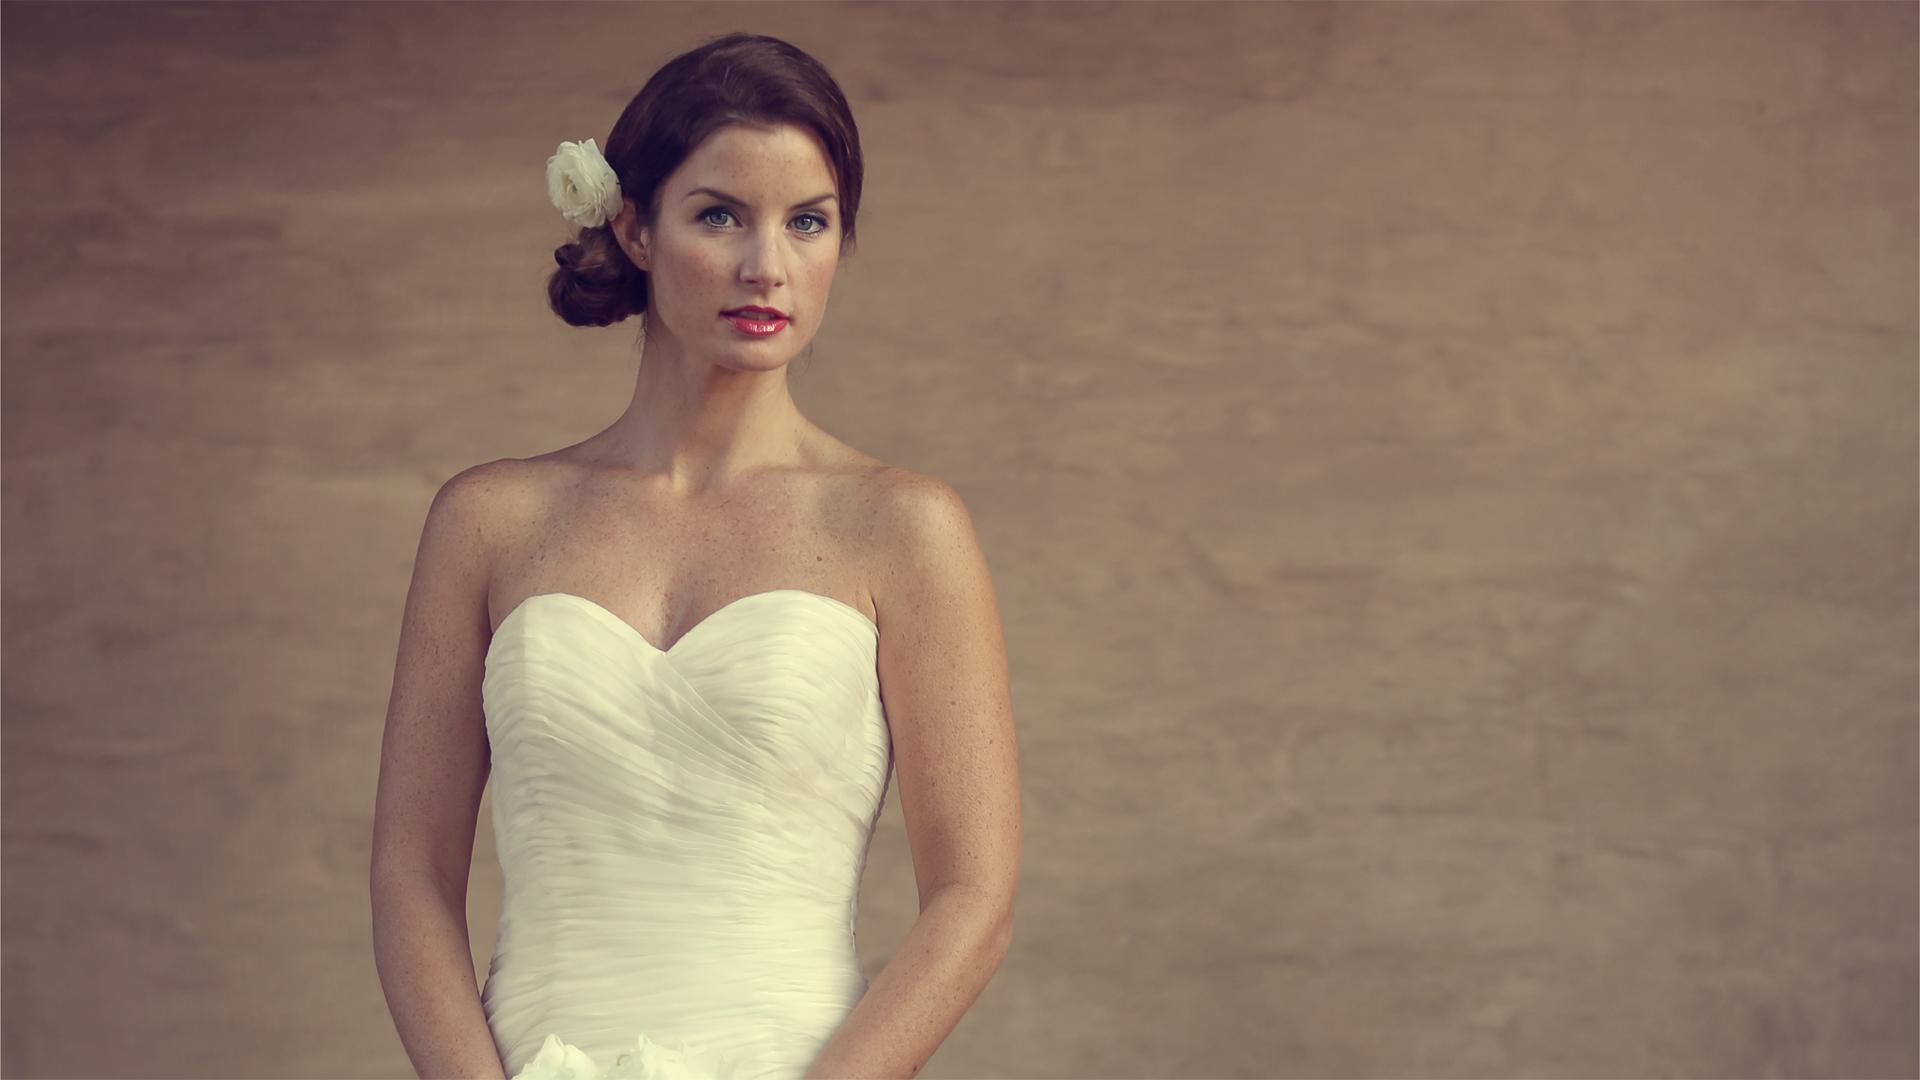 Retouching Bridal Portraits with Photoshop